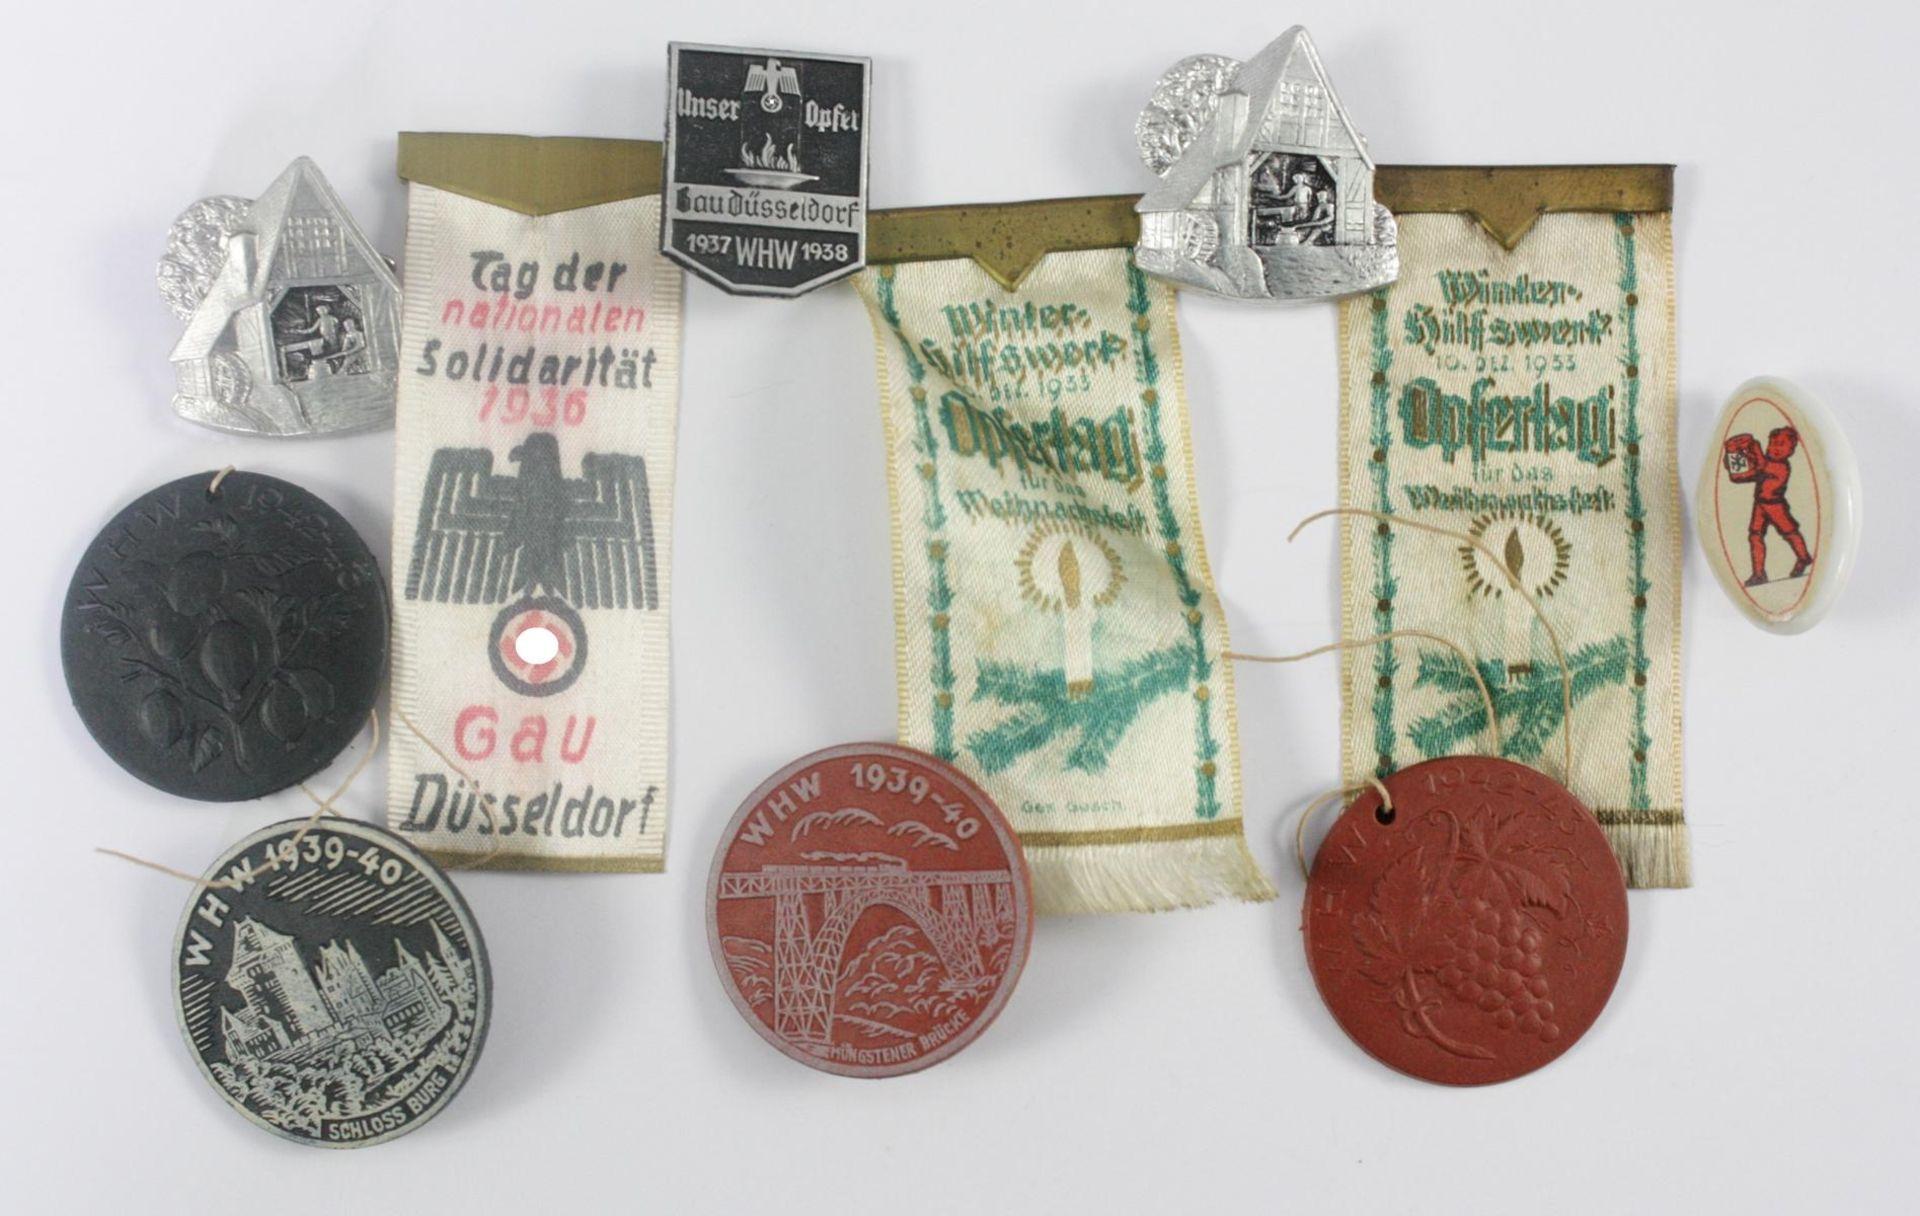 WHW-Spendenbelege Gau Düsseldorf